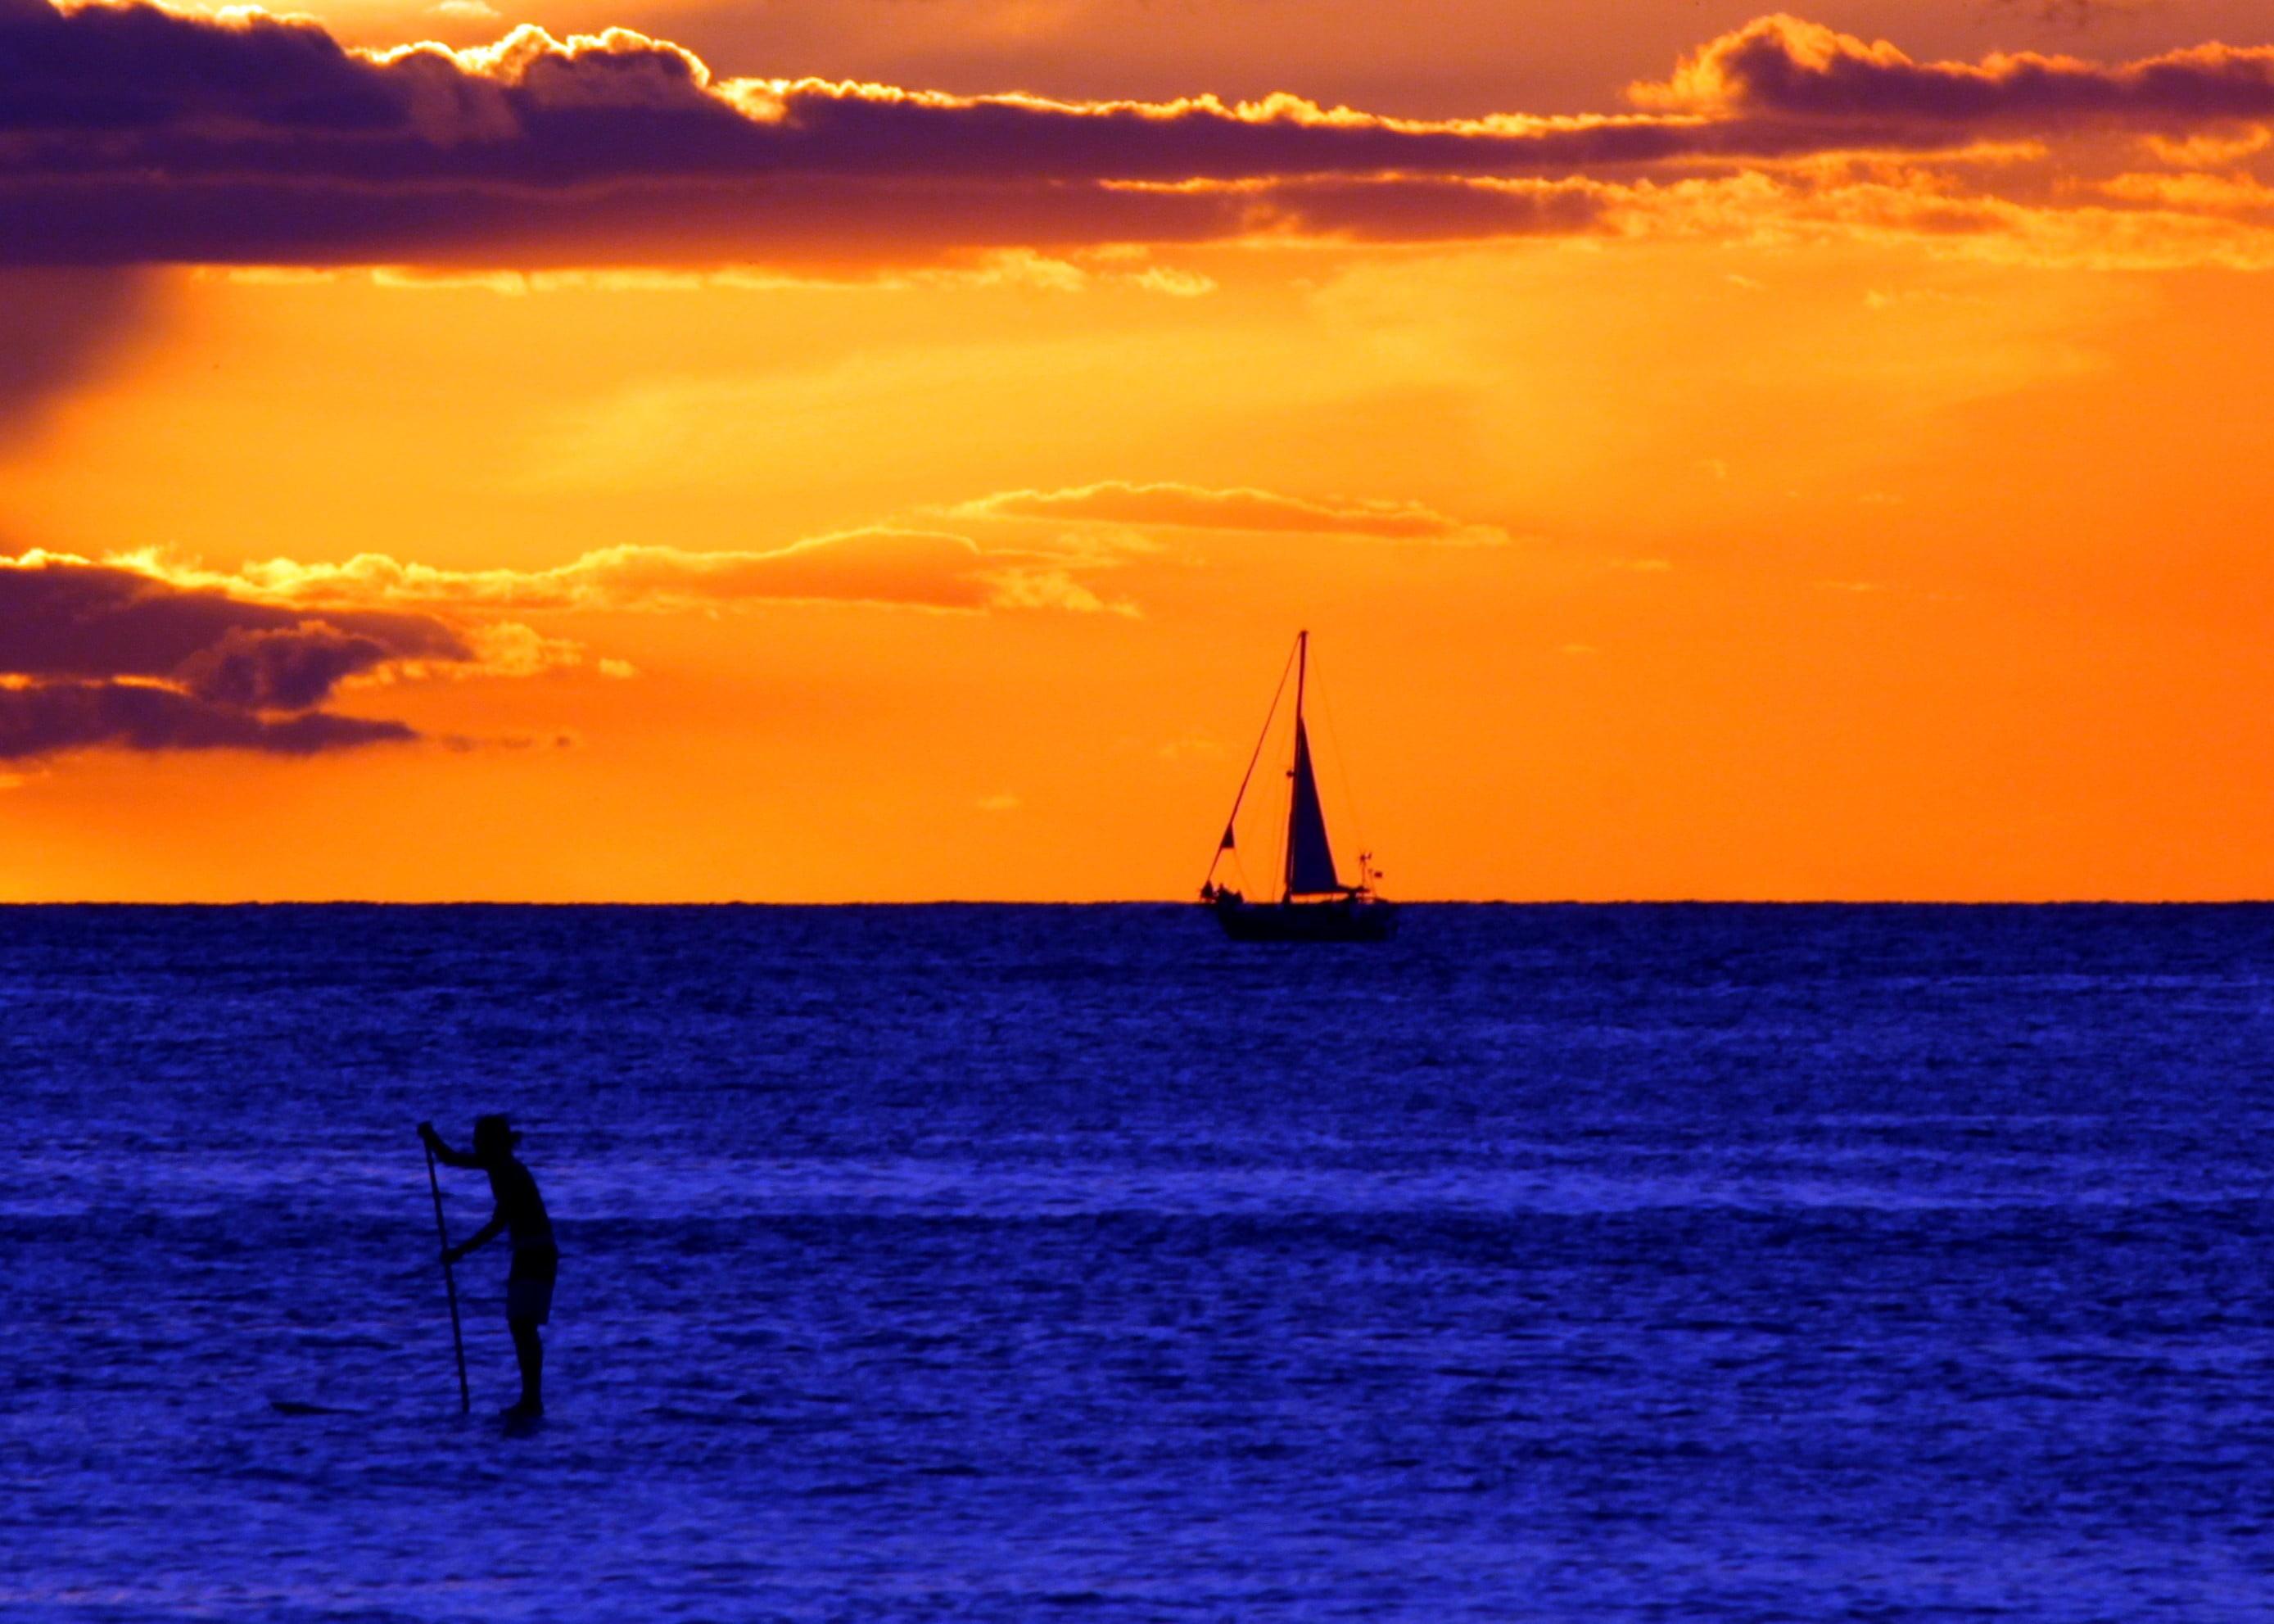 Res: 2777x1983, boat and body of water illustration, waikiki beach HD wallpaper